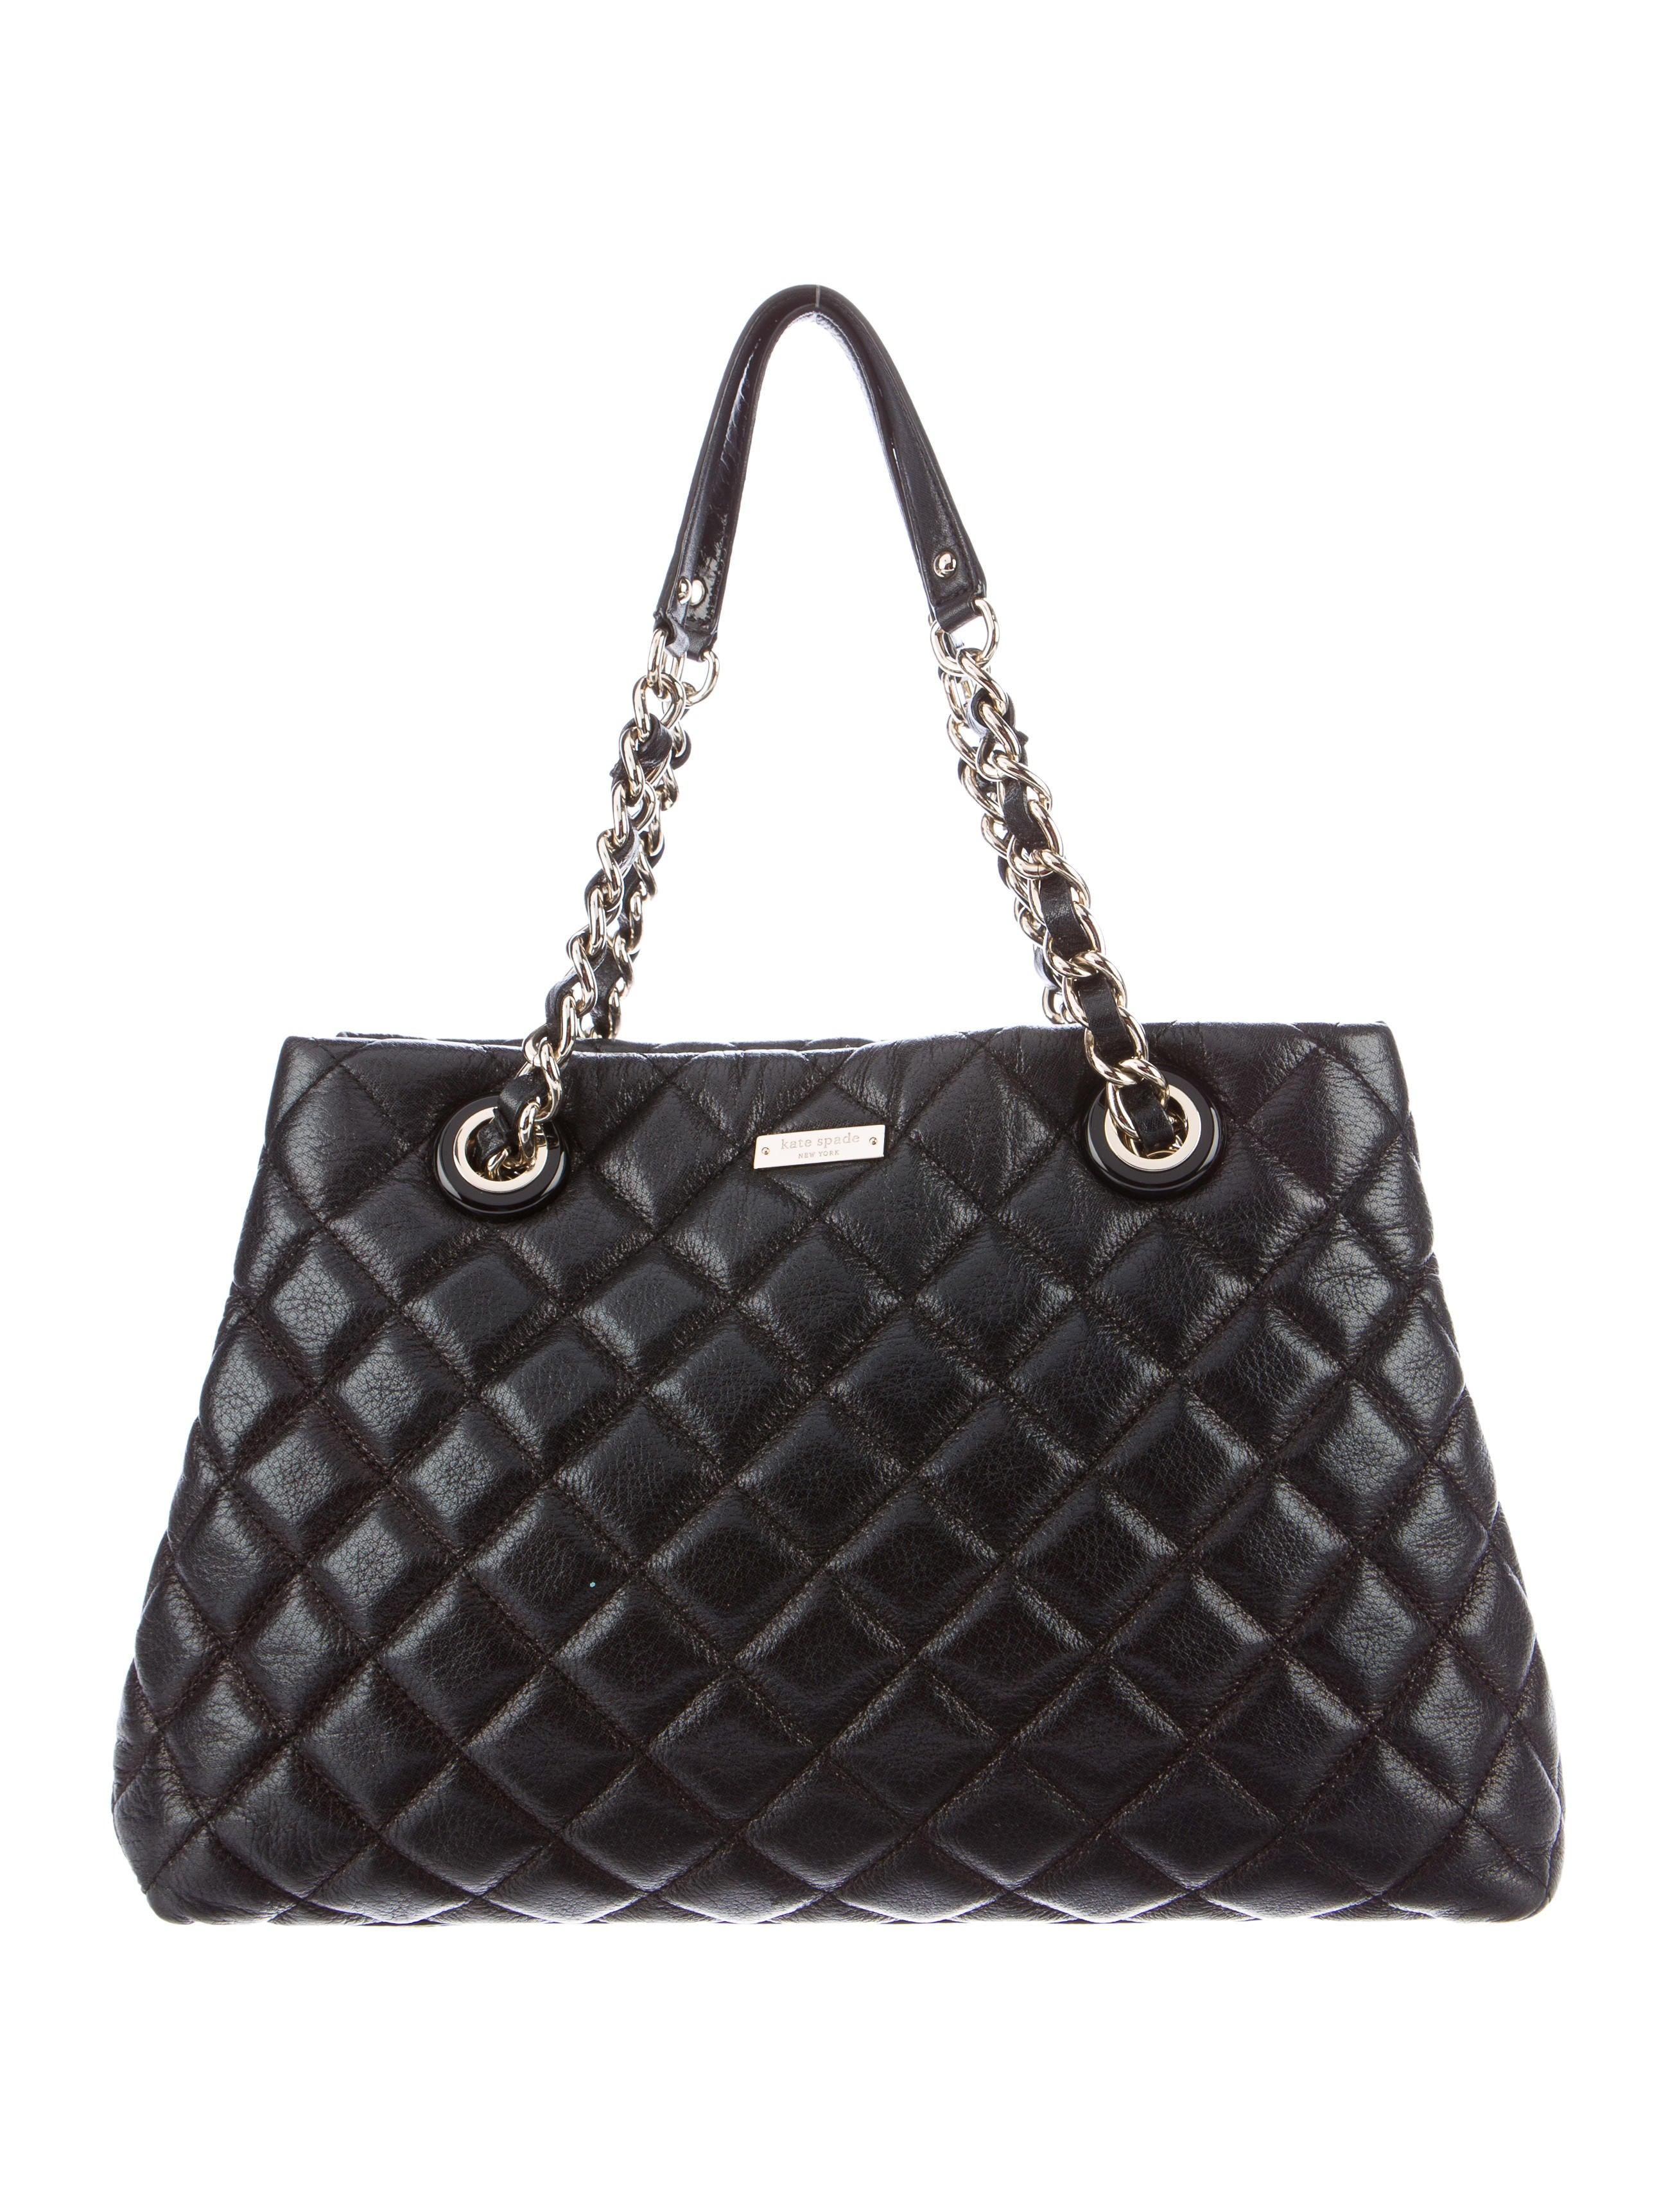 Kate Spade New York Gold Coast Maryanne Bag Handbags  : WKA546851enlarged from www.therealreal.com size 2612 x 3445 jpeg 710kB